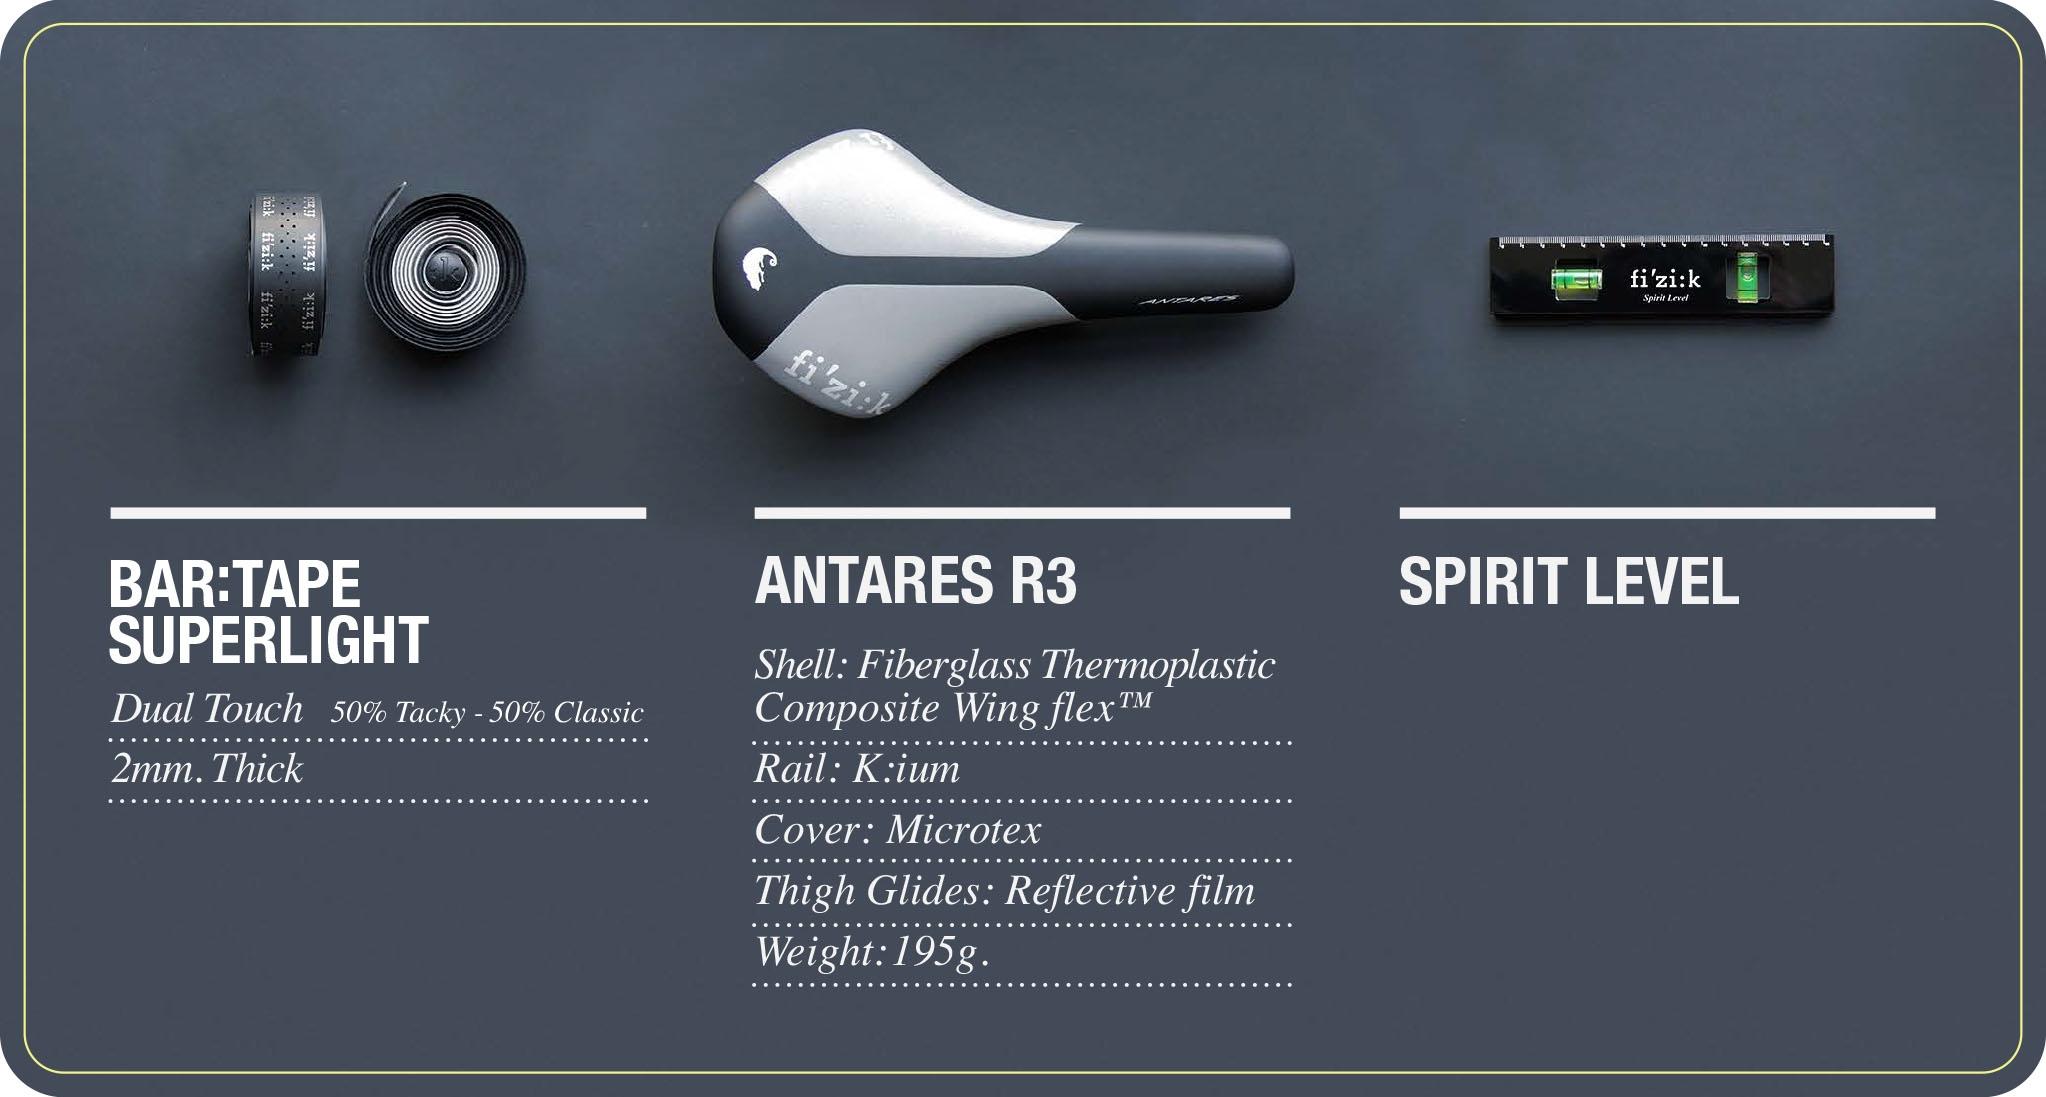 Antares R3 Tour Edition